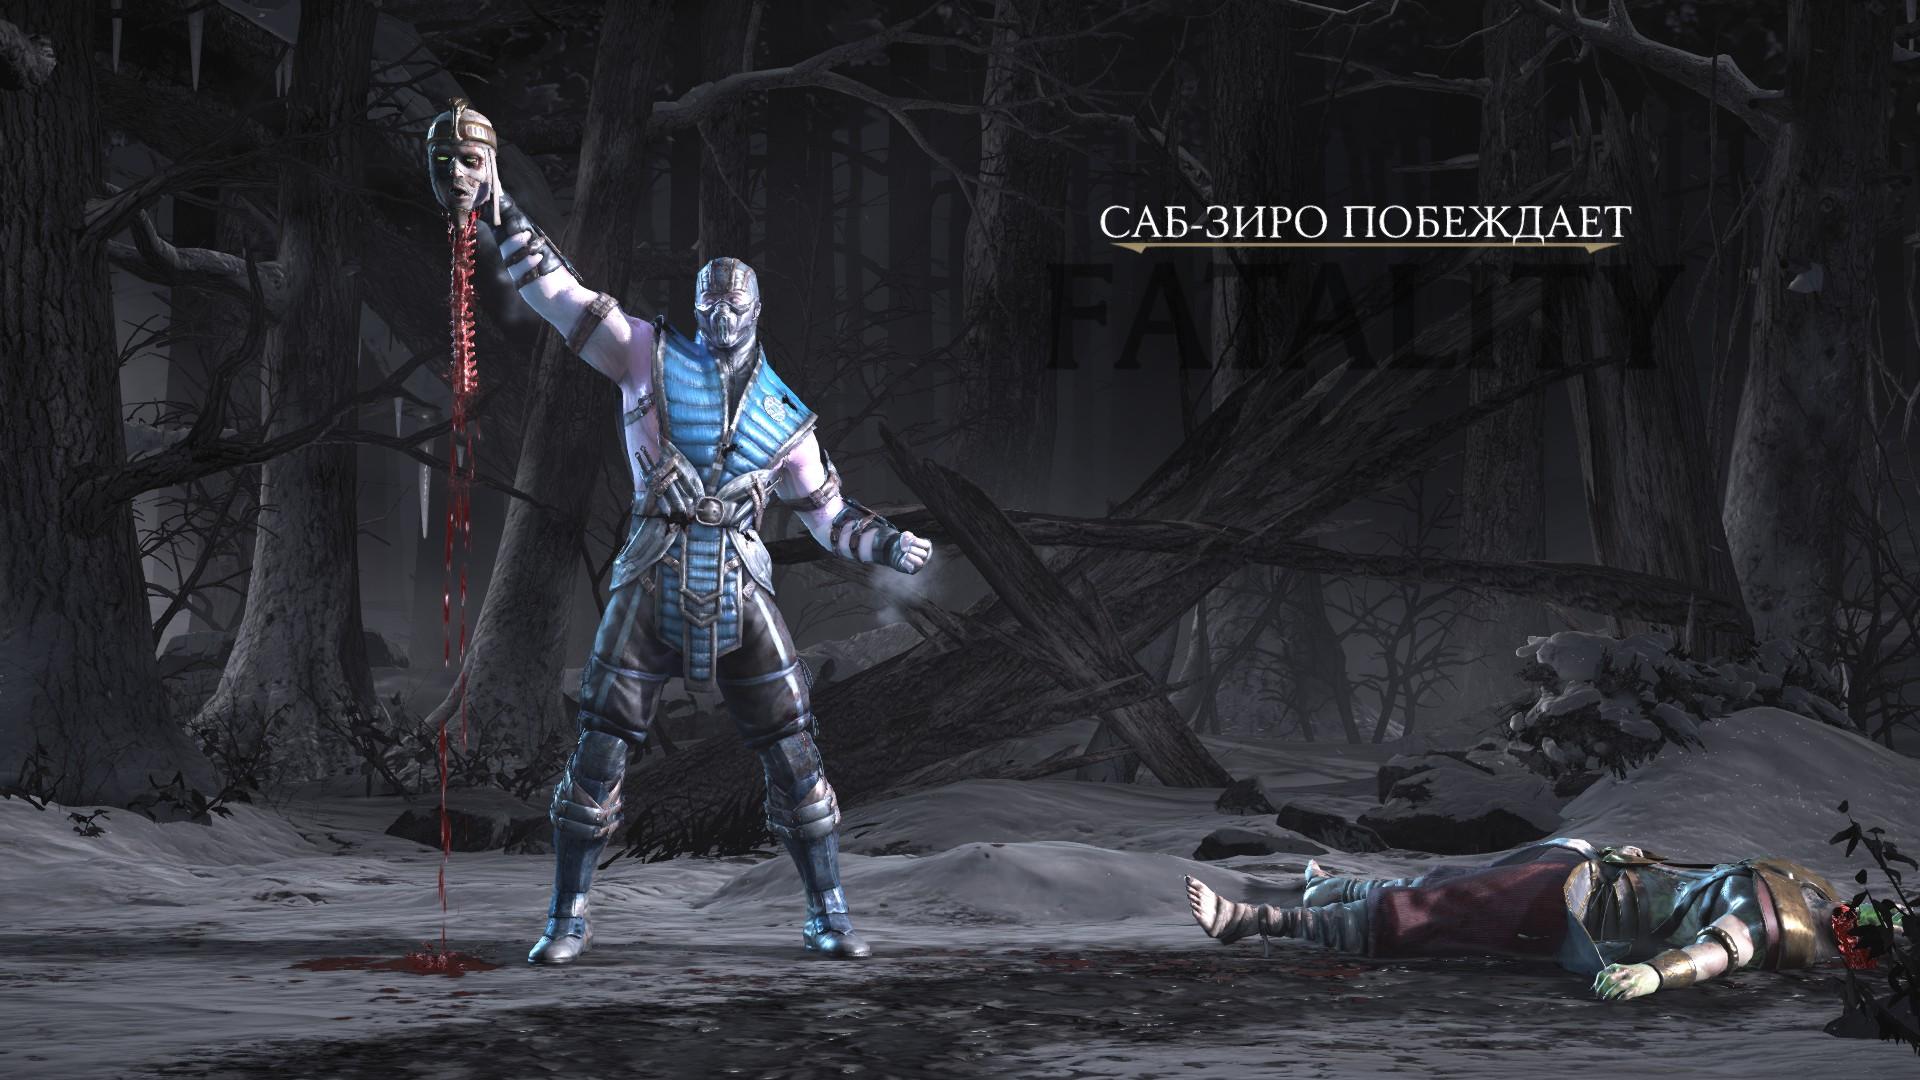 Класика Саб зиро - Mortal Kombat X kombat, mortal, x, Класика, привет